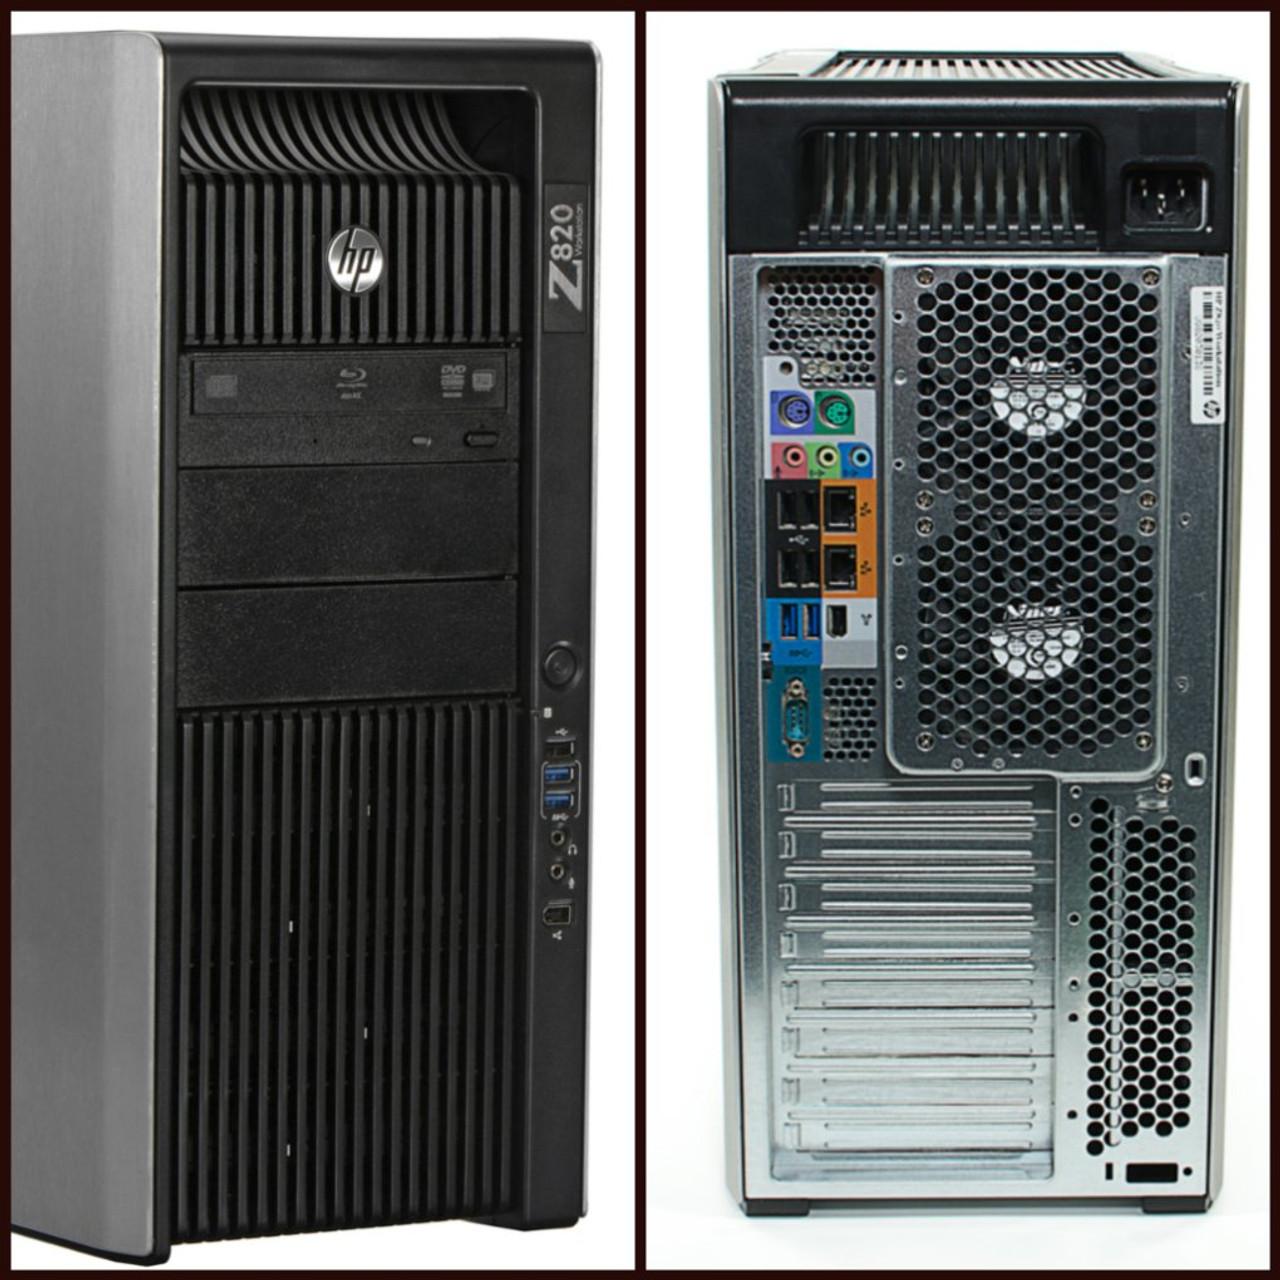 HP Workstation Z820 Tower Dual Six Core Intel Xeon 2.50GHz, 32GB Ram, 500GB SSD, DVD-RW, Windows 10 Pro 64 Desktop Computer